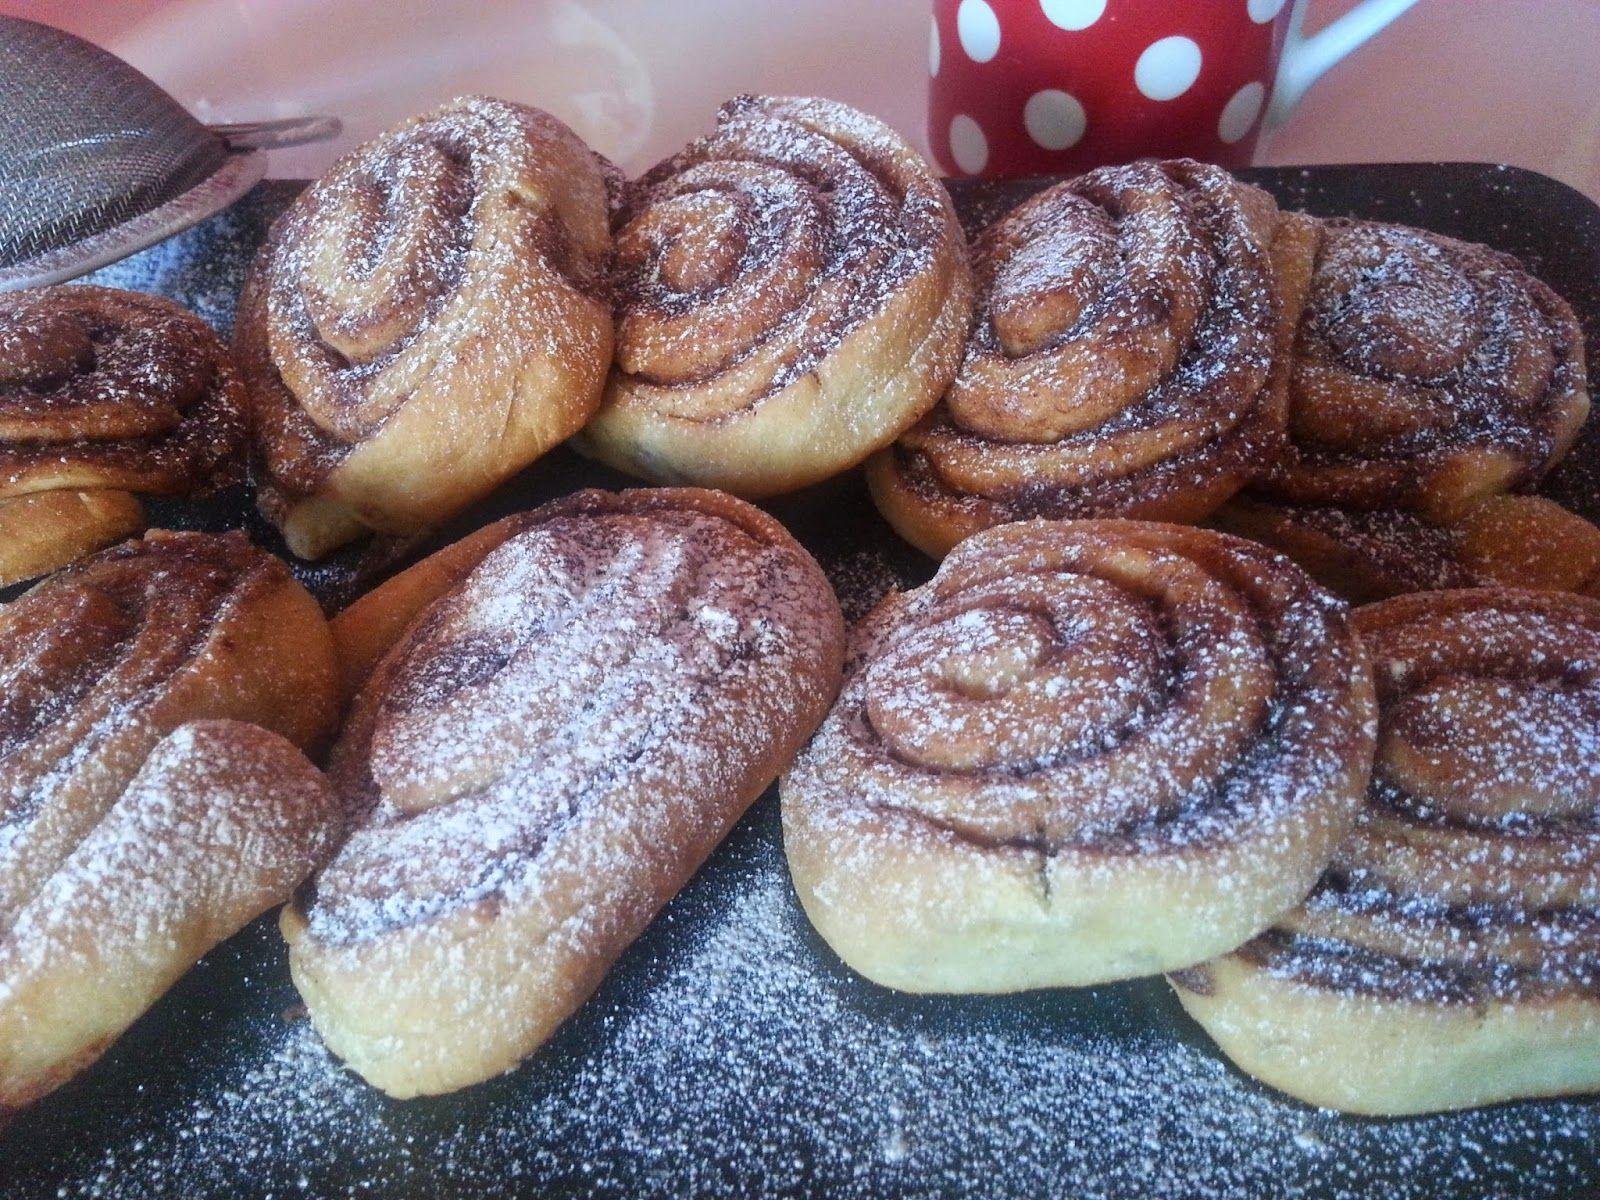 yummy sweets: Škoricové hniezda